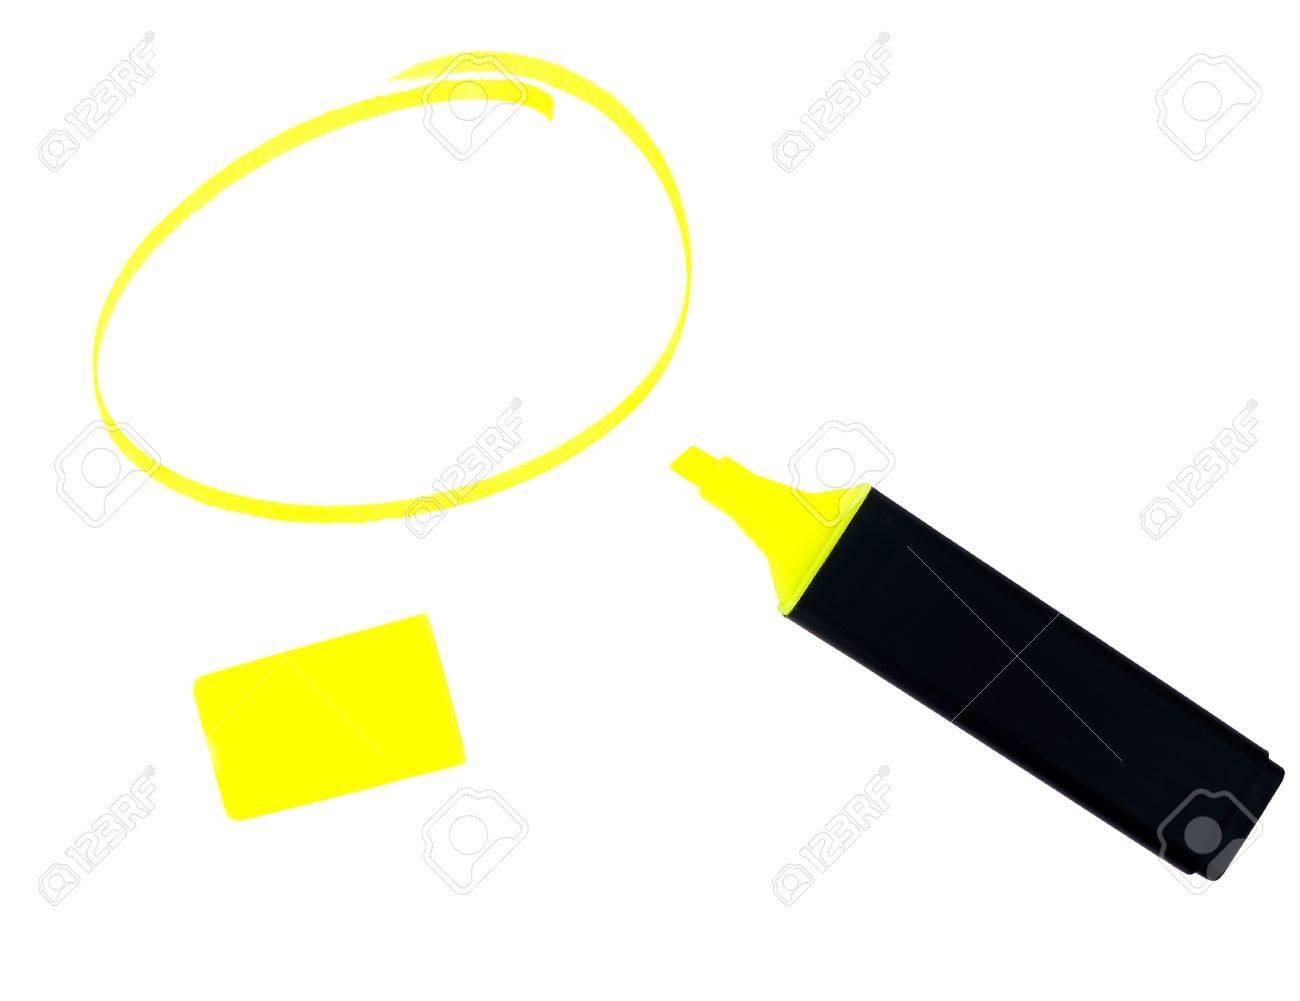 Vivid highlighter pen, lid and circle shape Stock Photo - 15048507